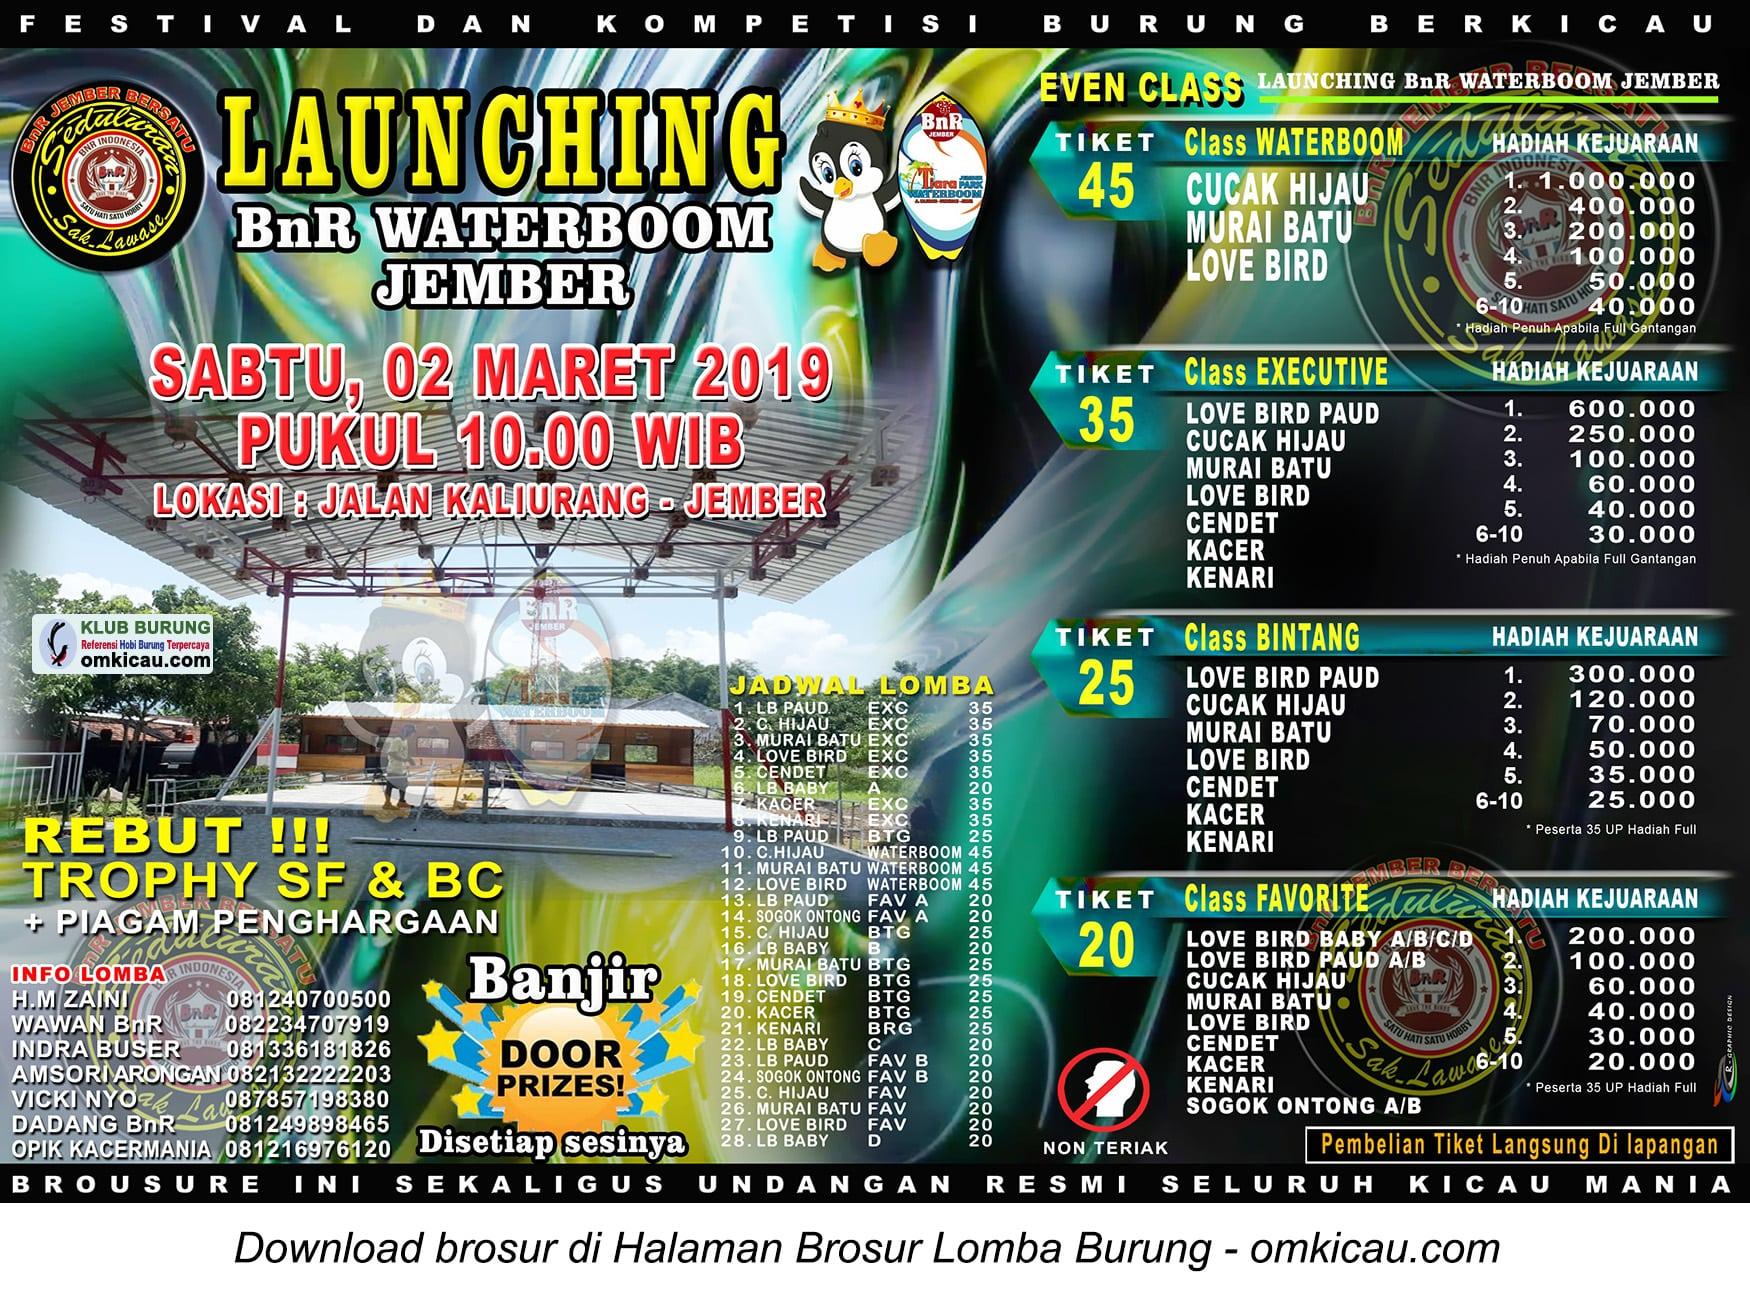 Launching BnR Waterboom